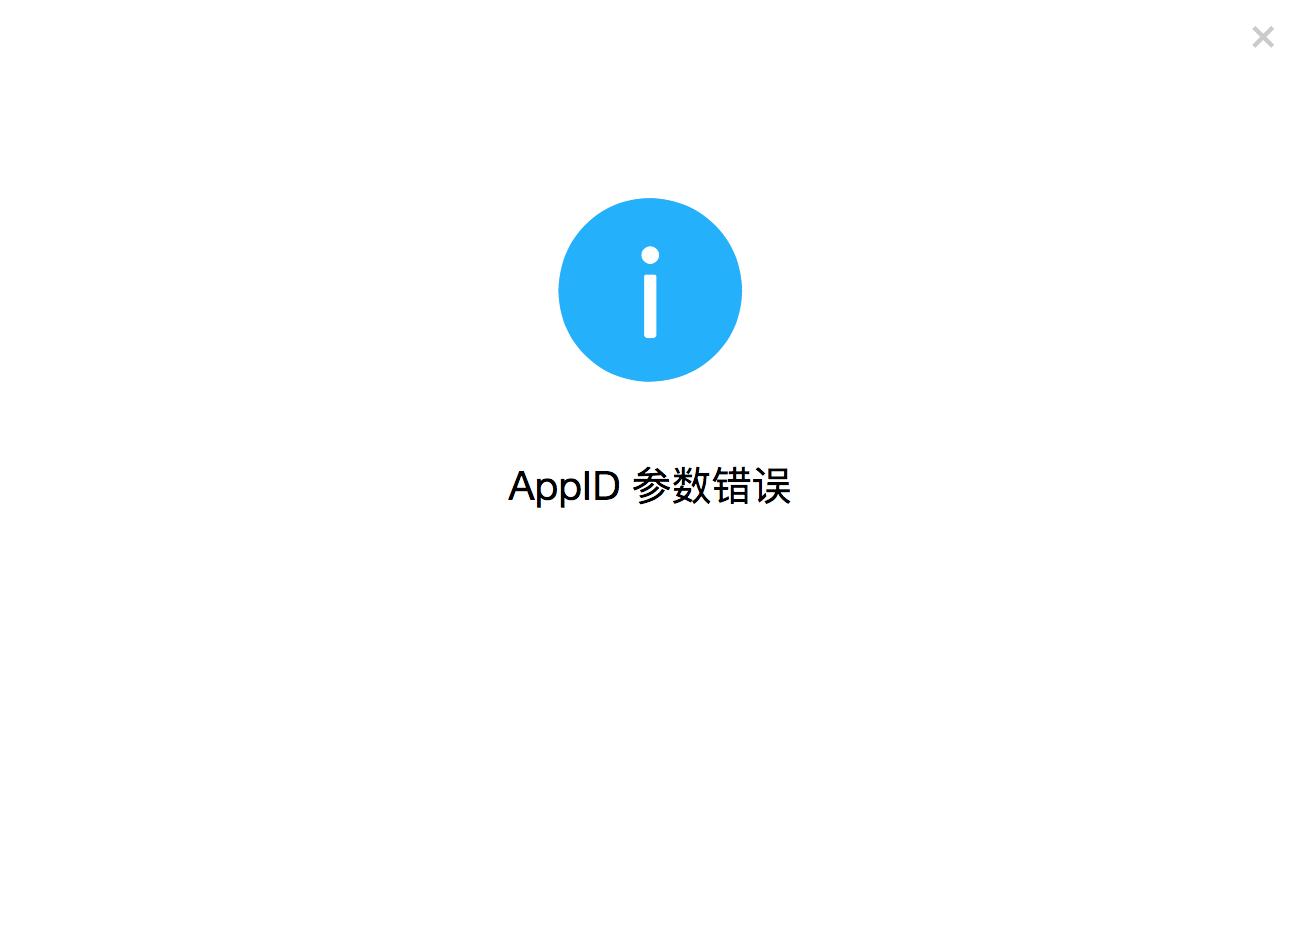 AppID 参数错误